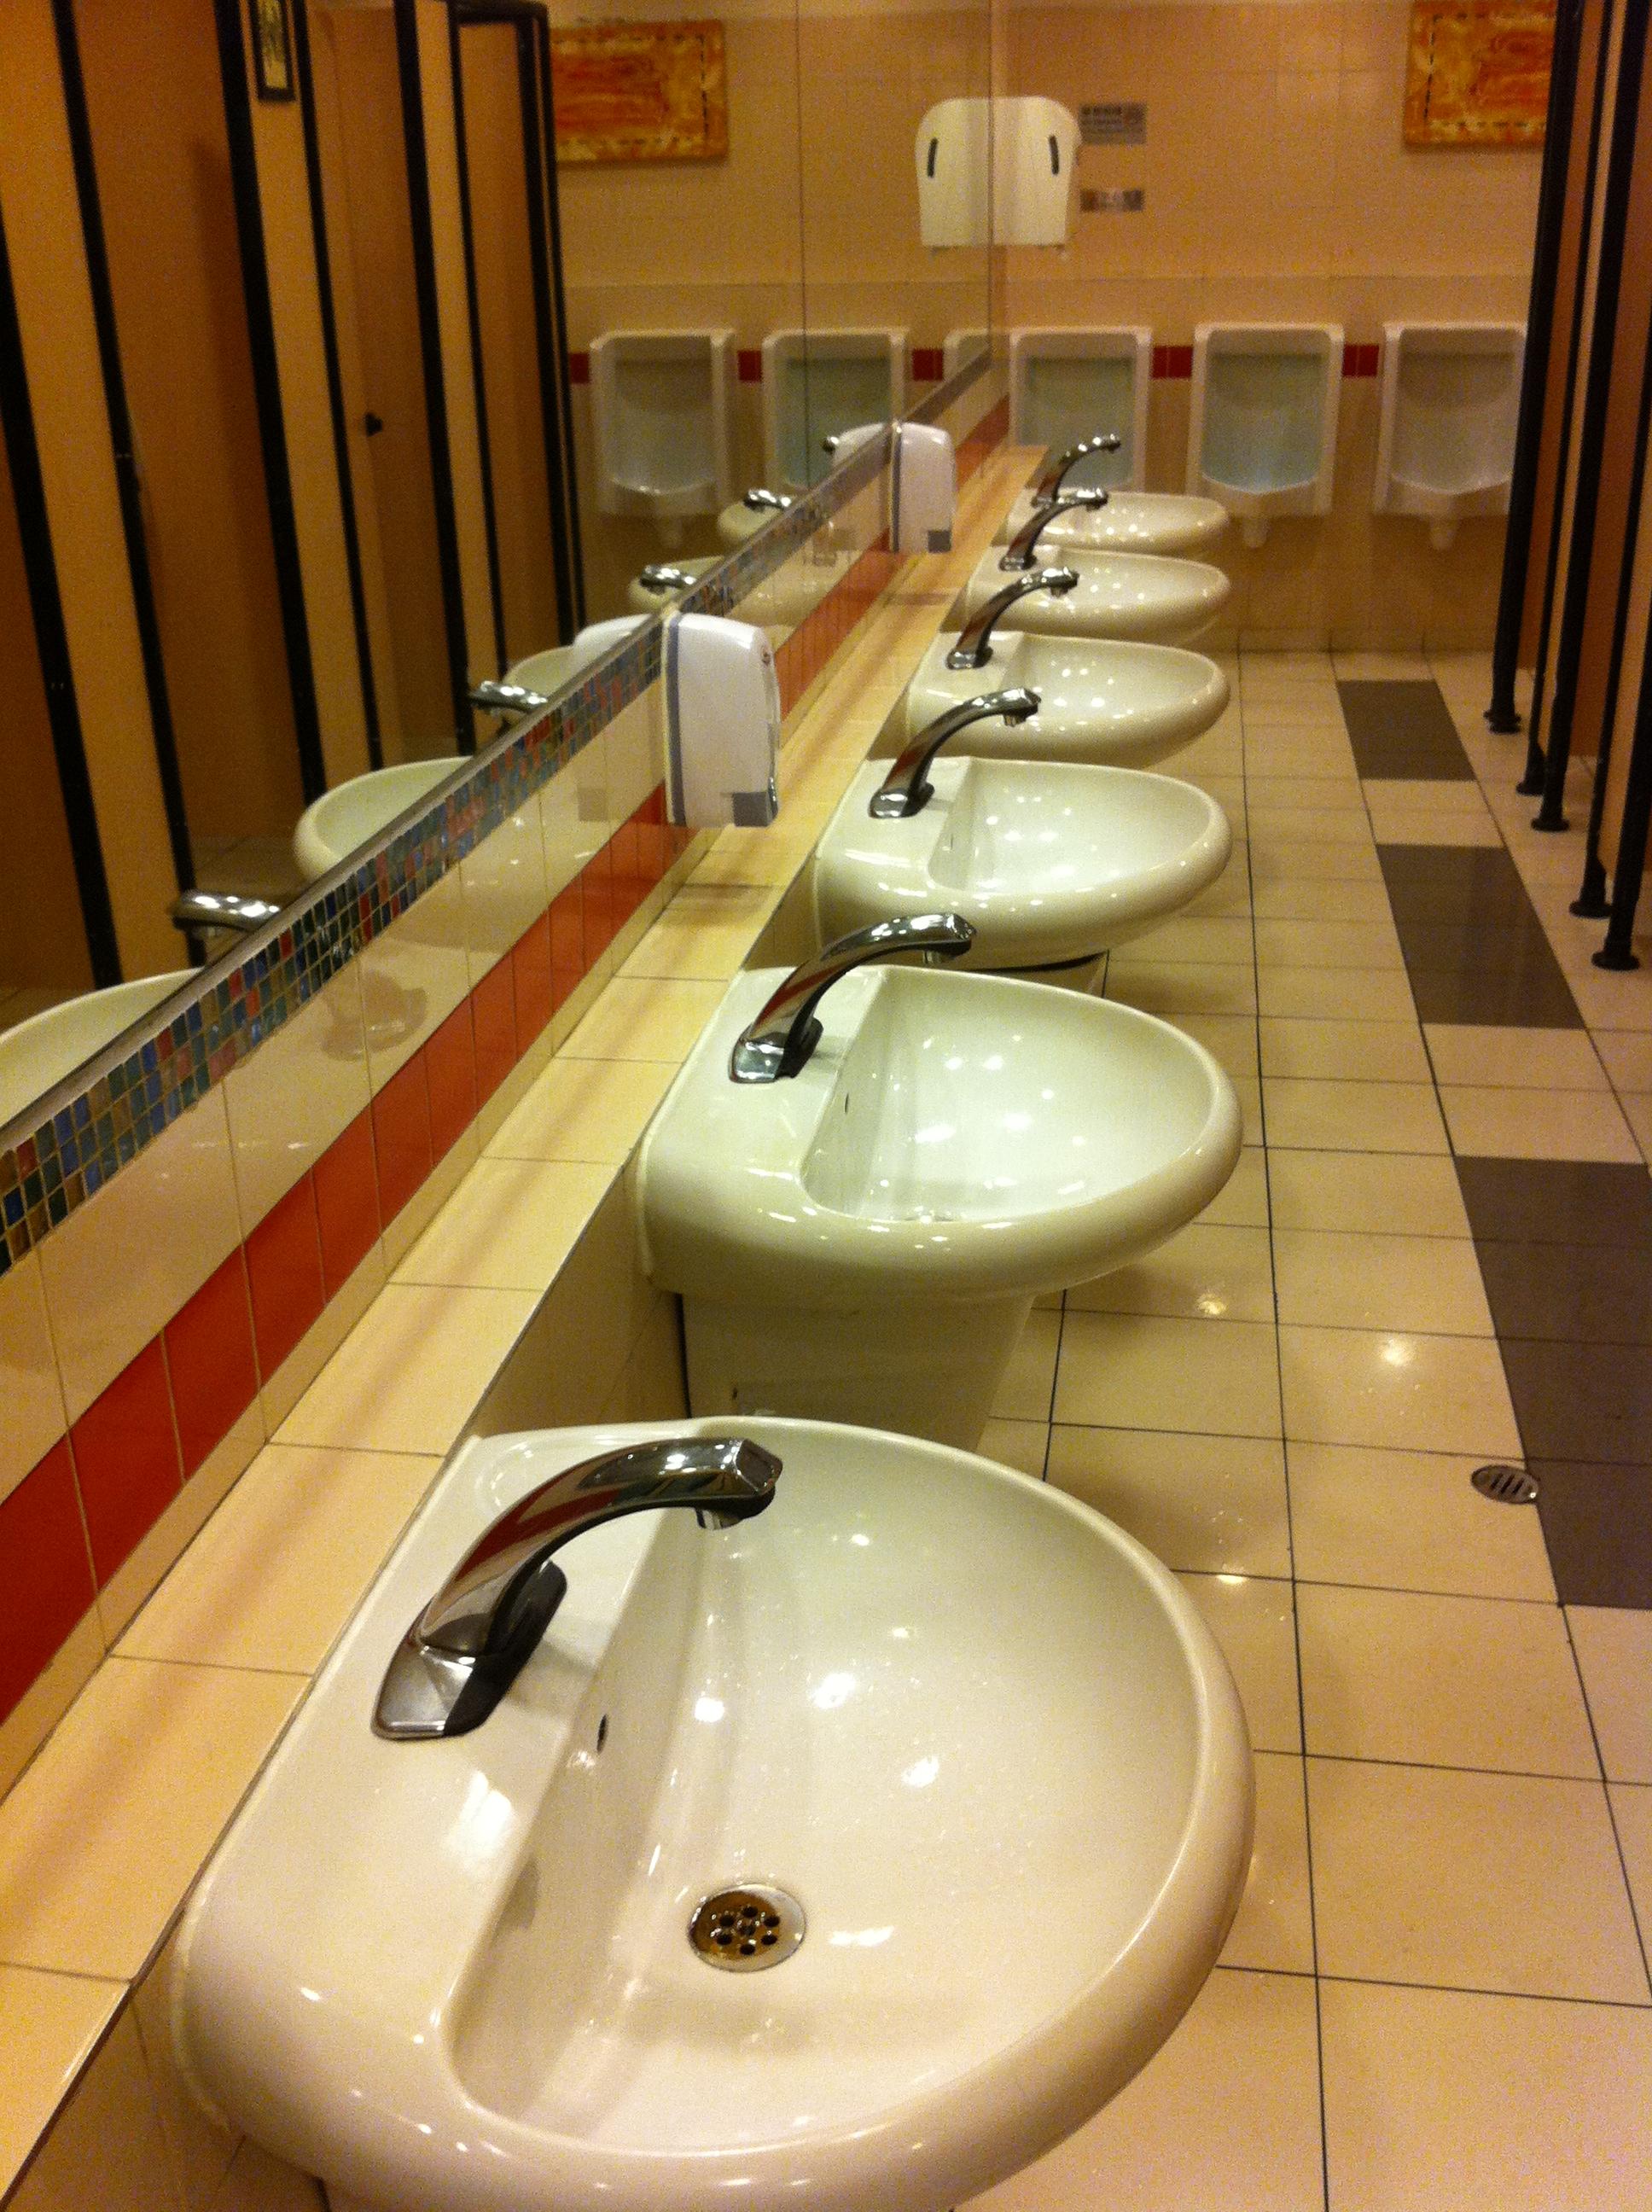 file hk tst china hong kong city toilet interior sink jan 2013 jpg wikimedia commons. Black Bedroom Furniture Sets. Home Design Ideas